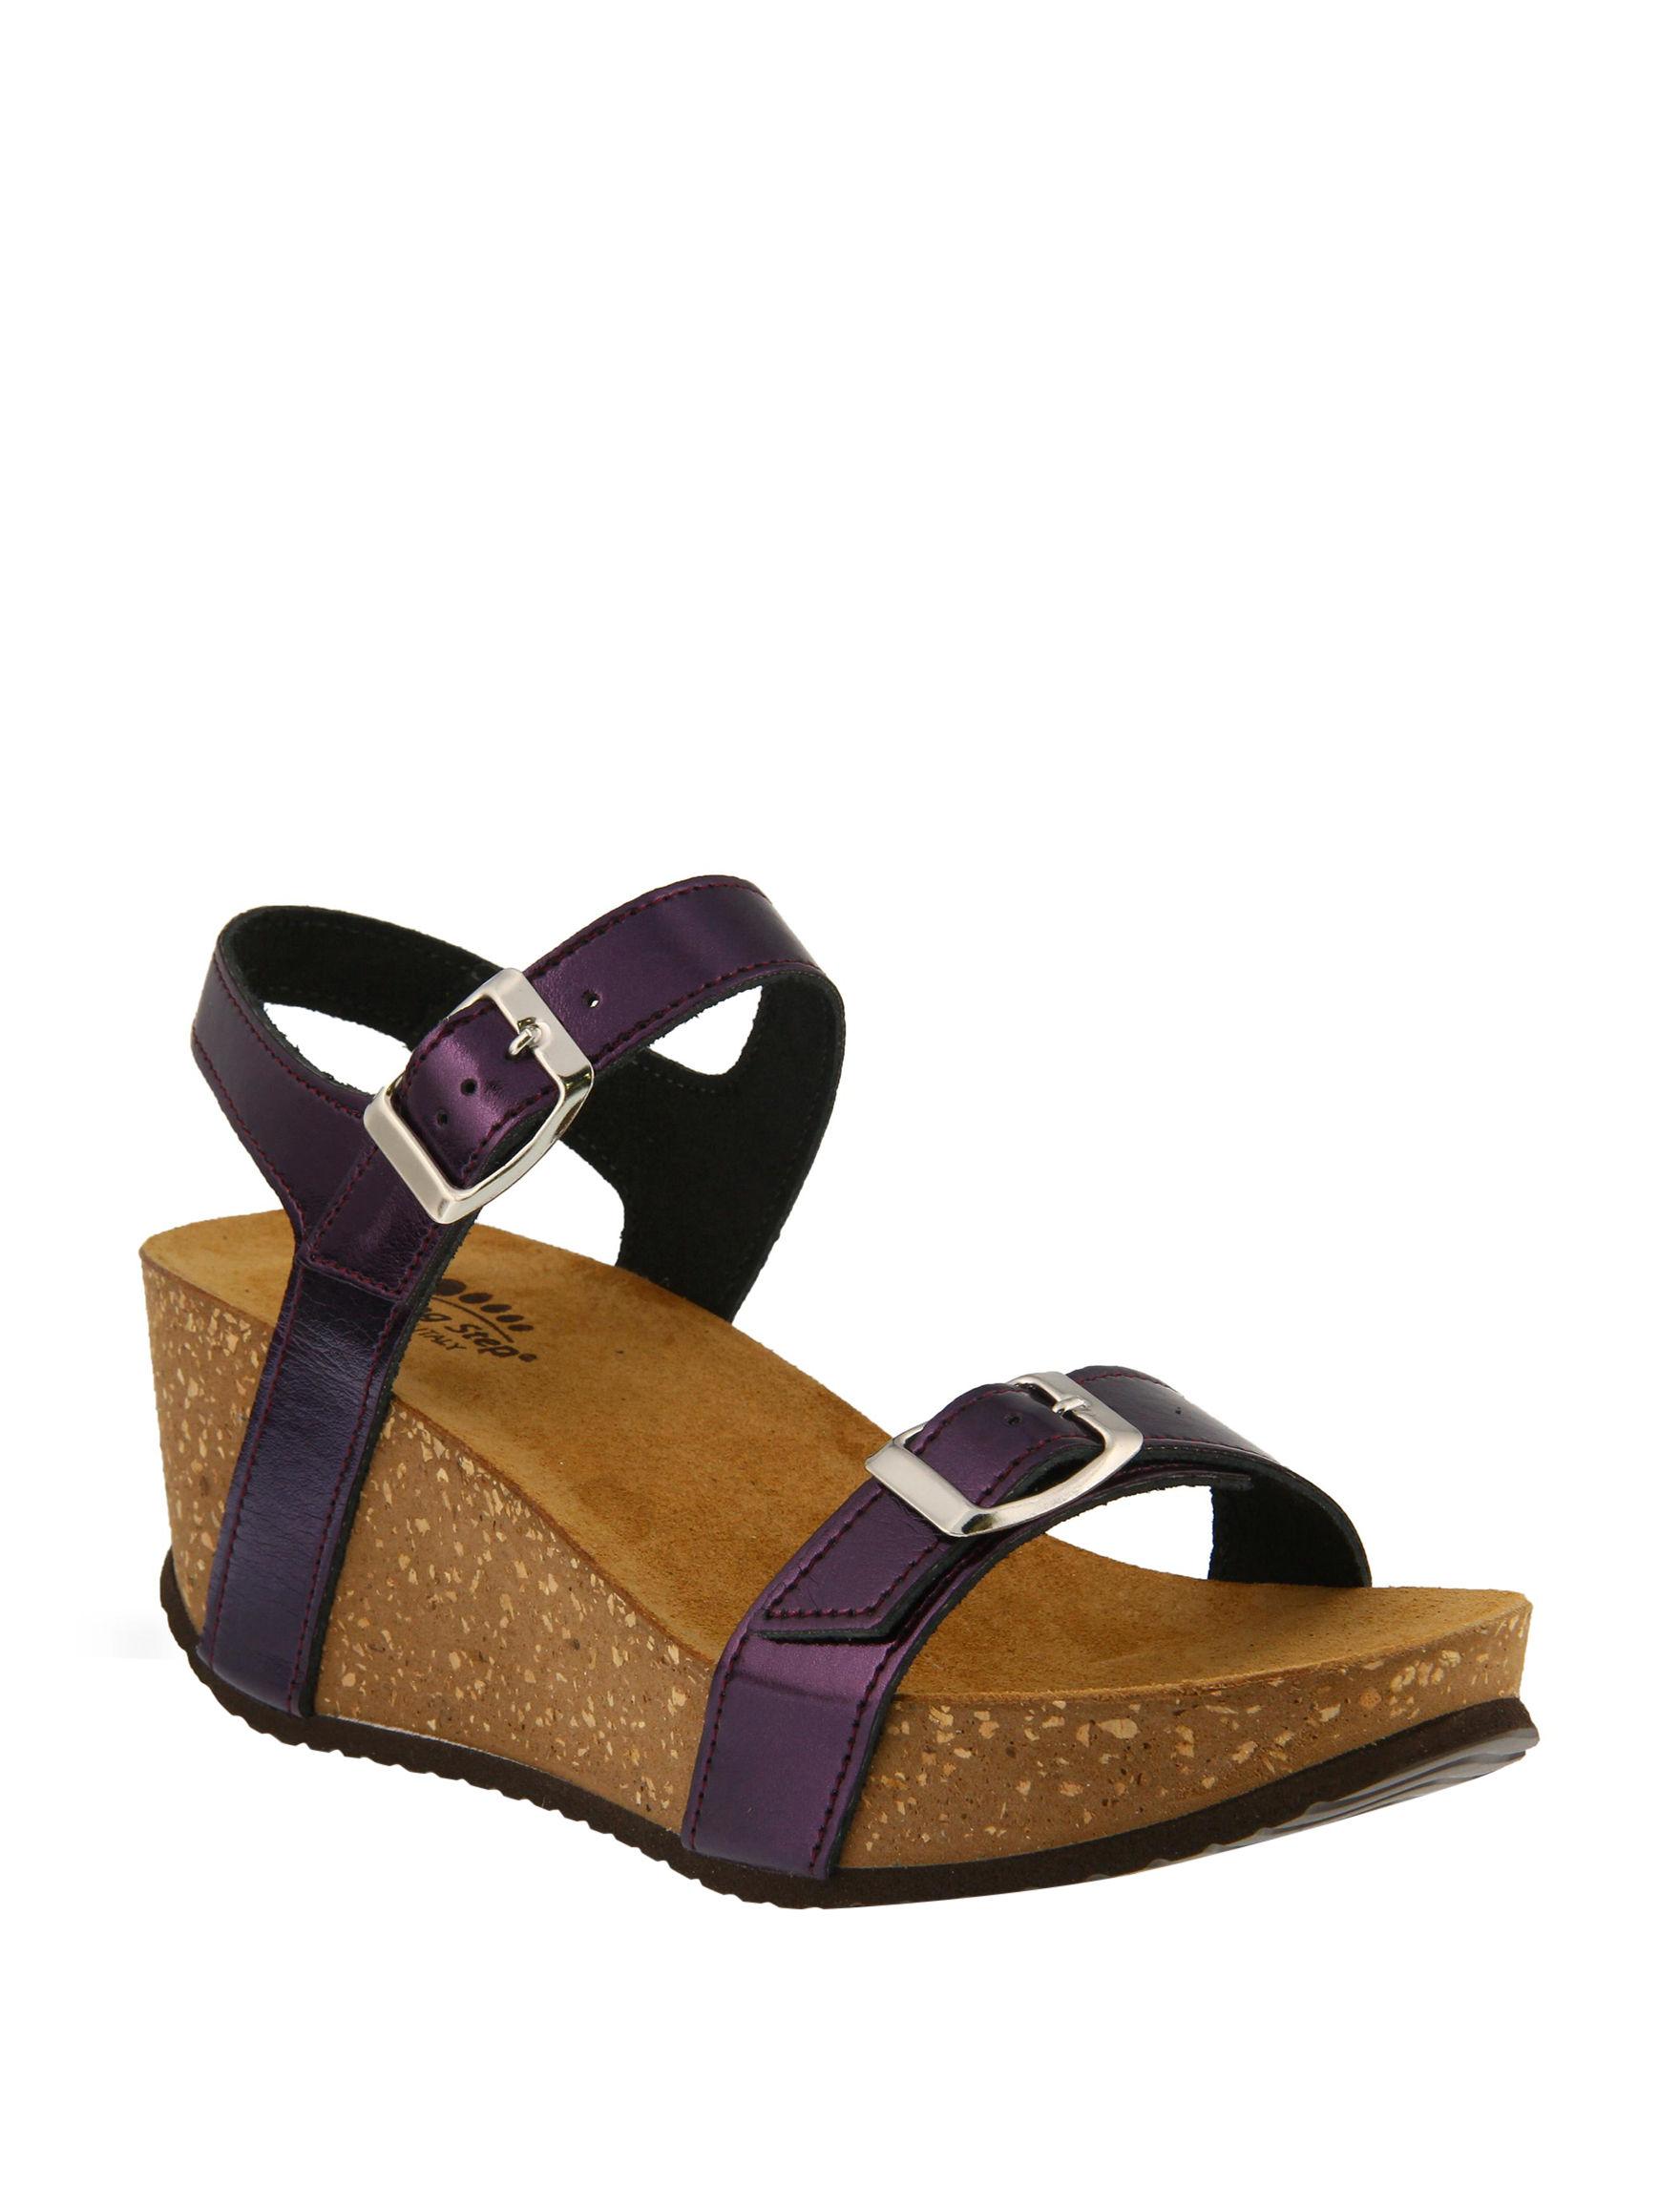 Spring Step Plum Wedge Sandals